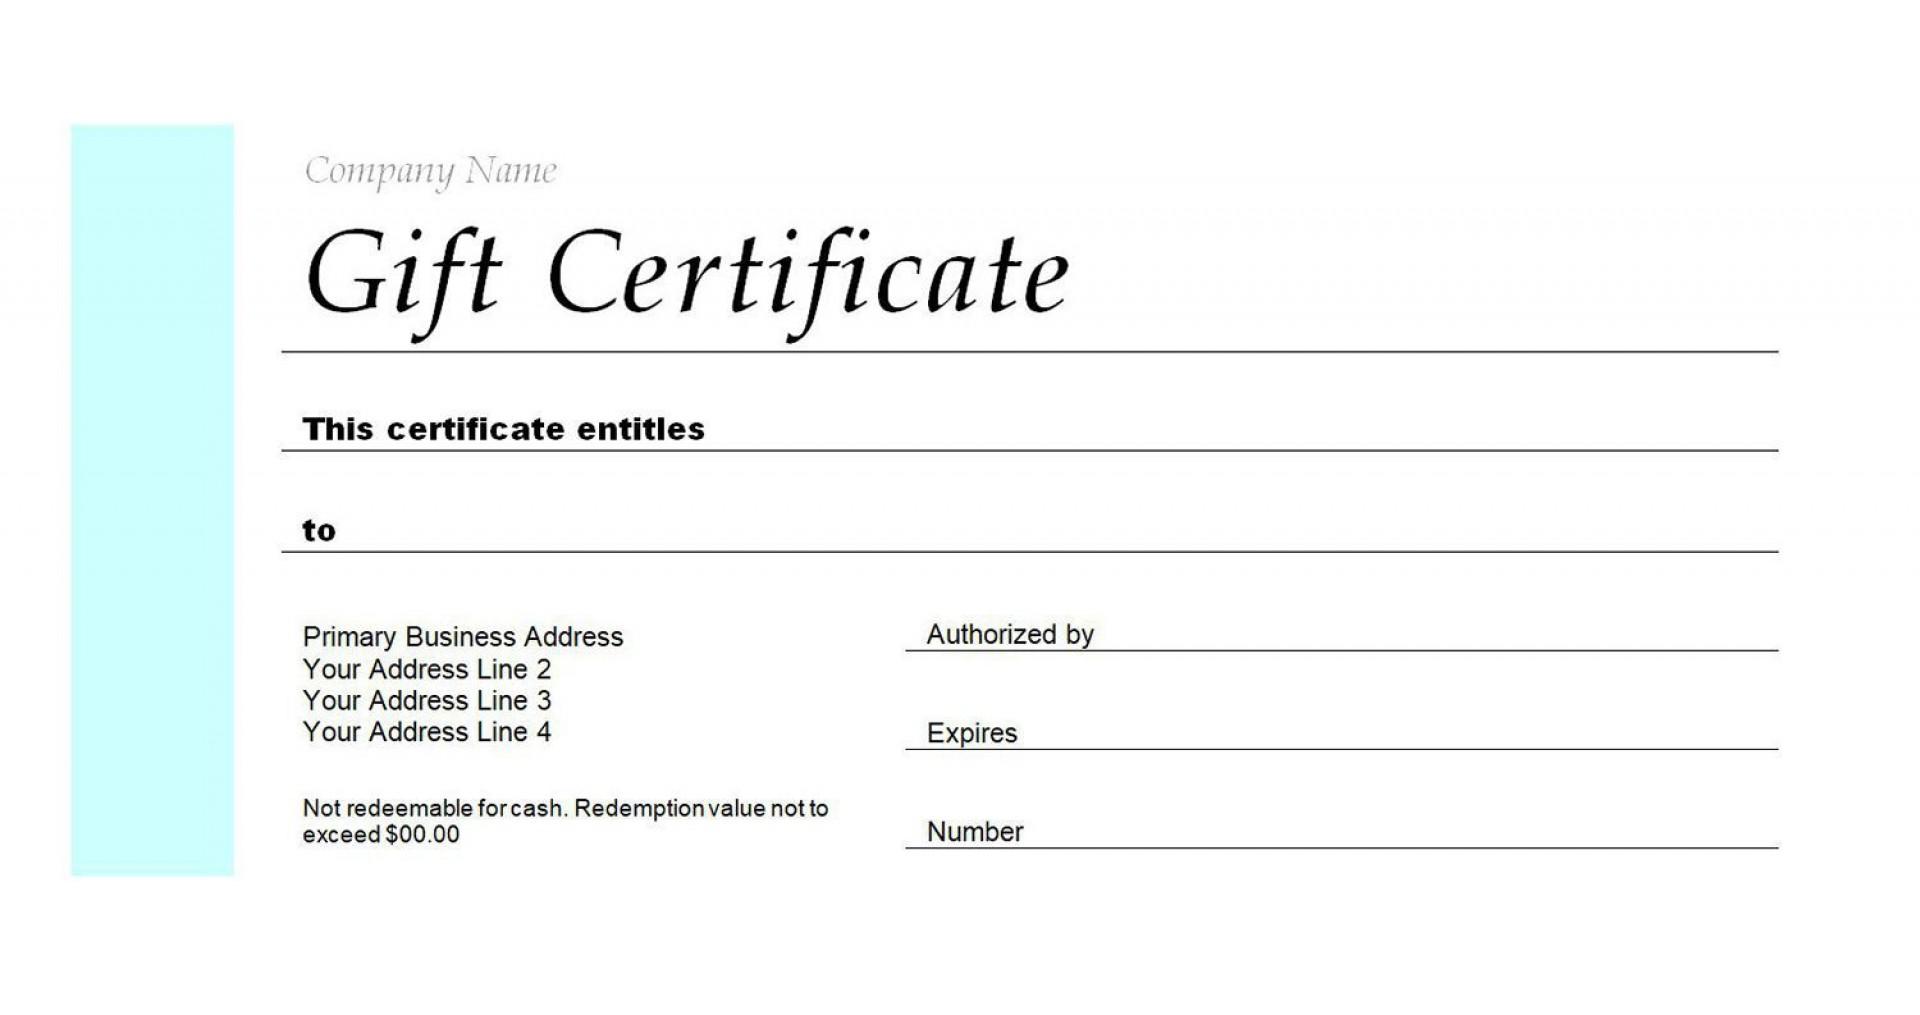 005 Wonderful Blank Gift Certificate Template Idea  Free Printable Downloadable1920